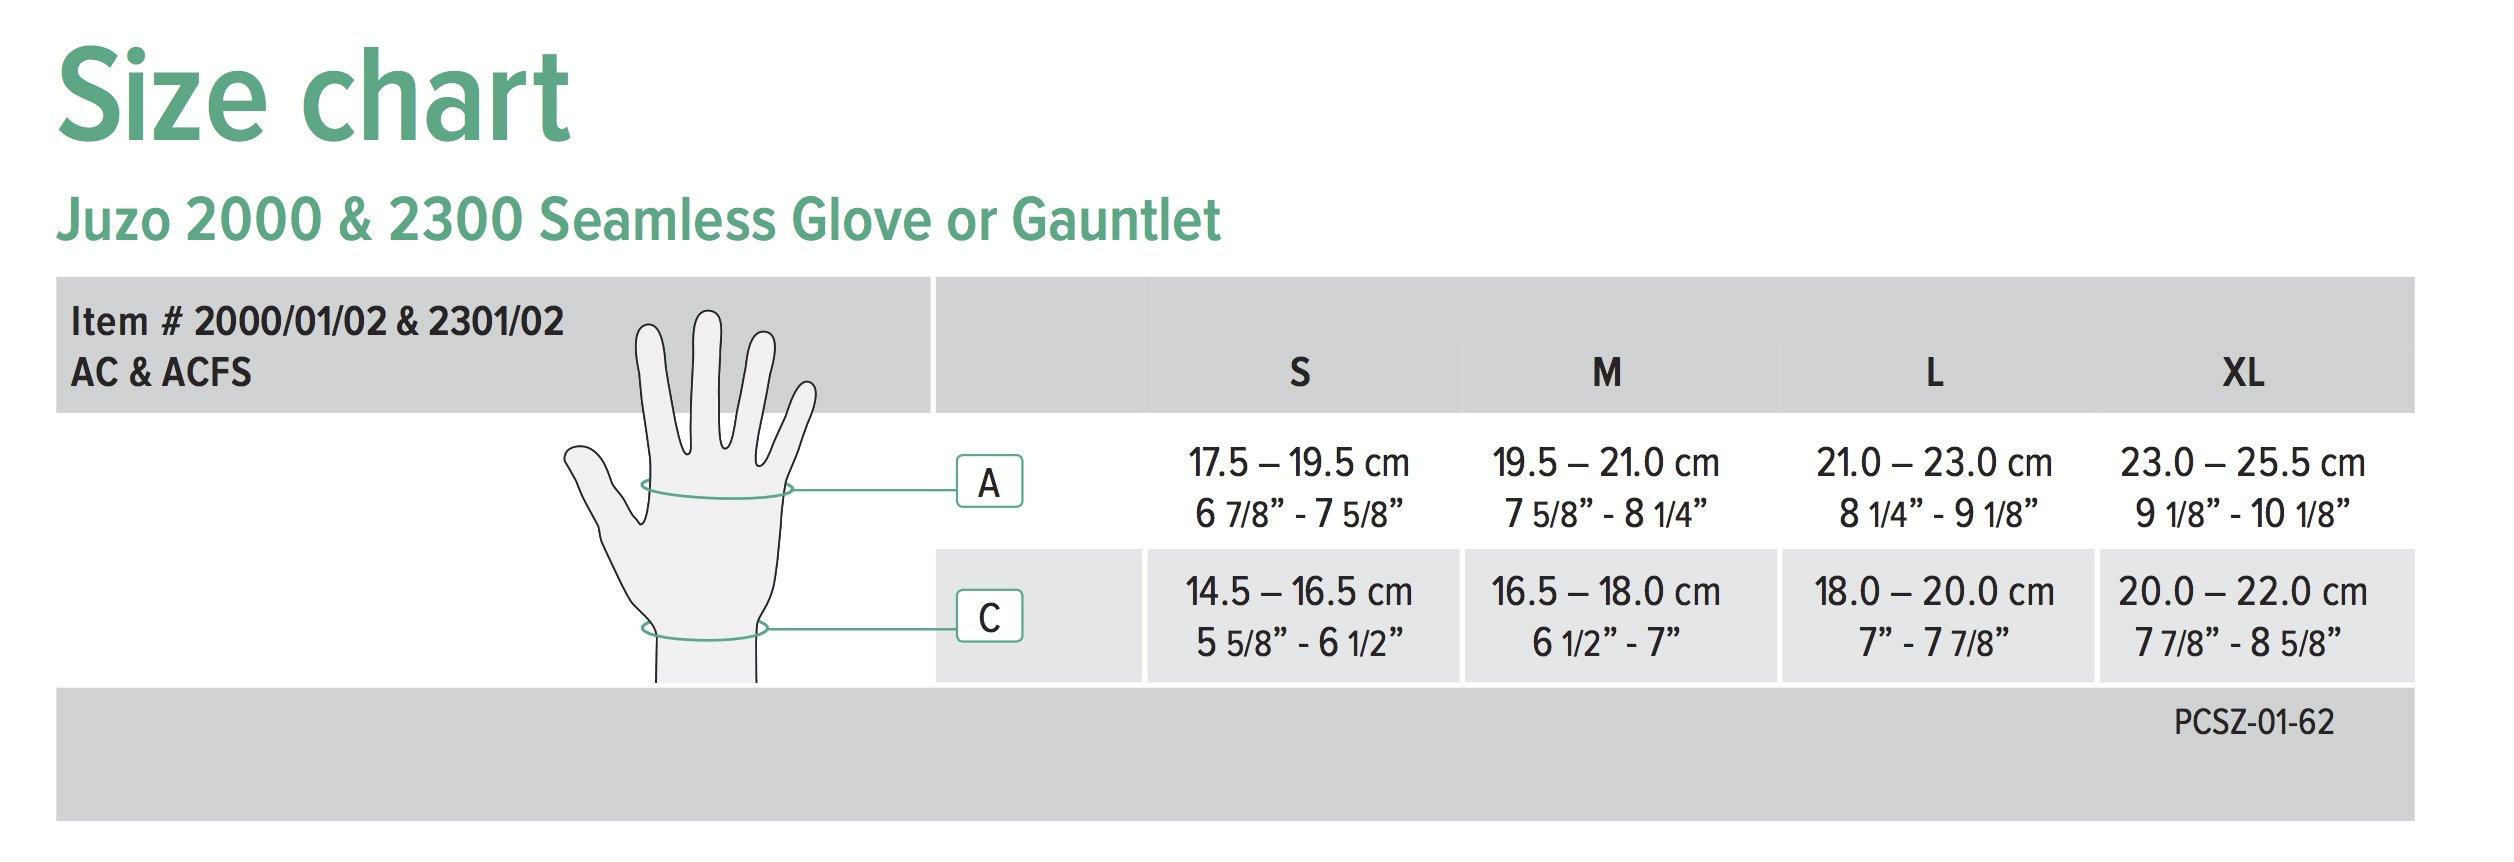 juzo seamless glove gauntlet size chart